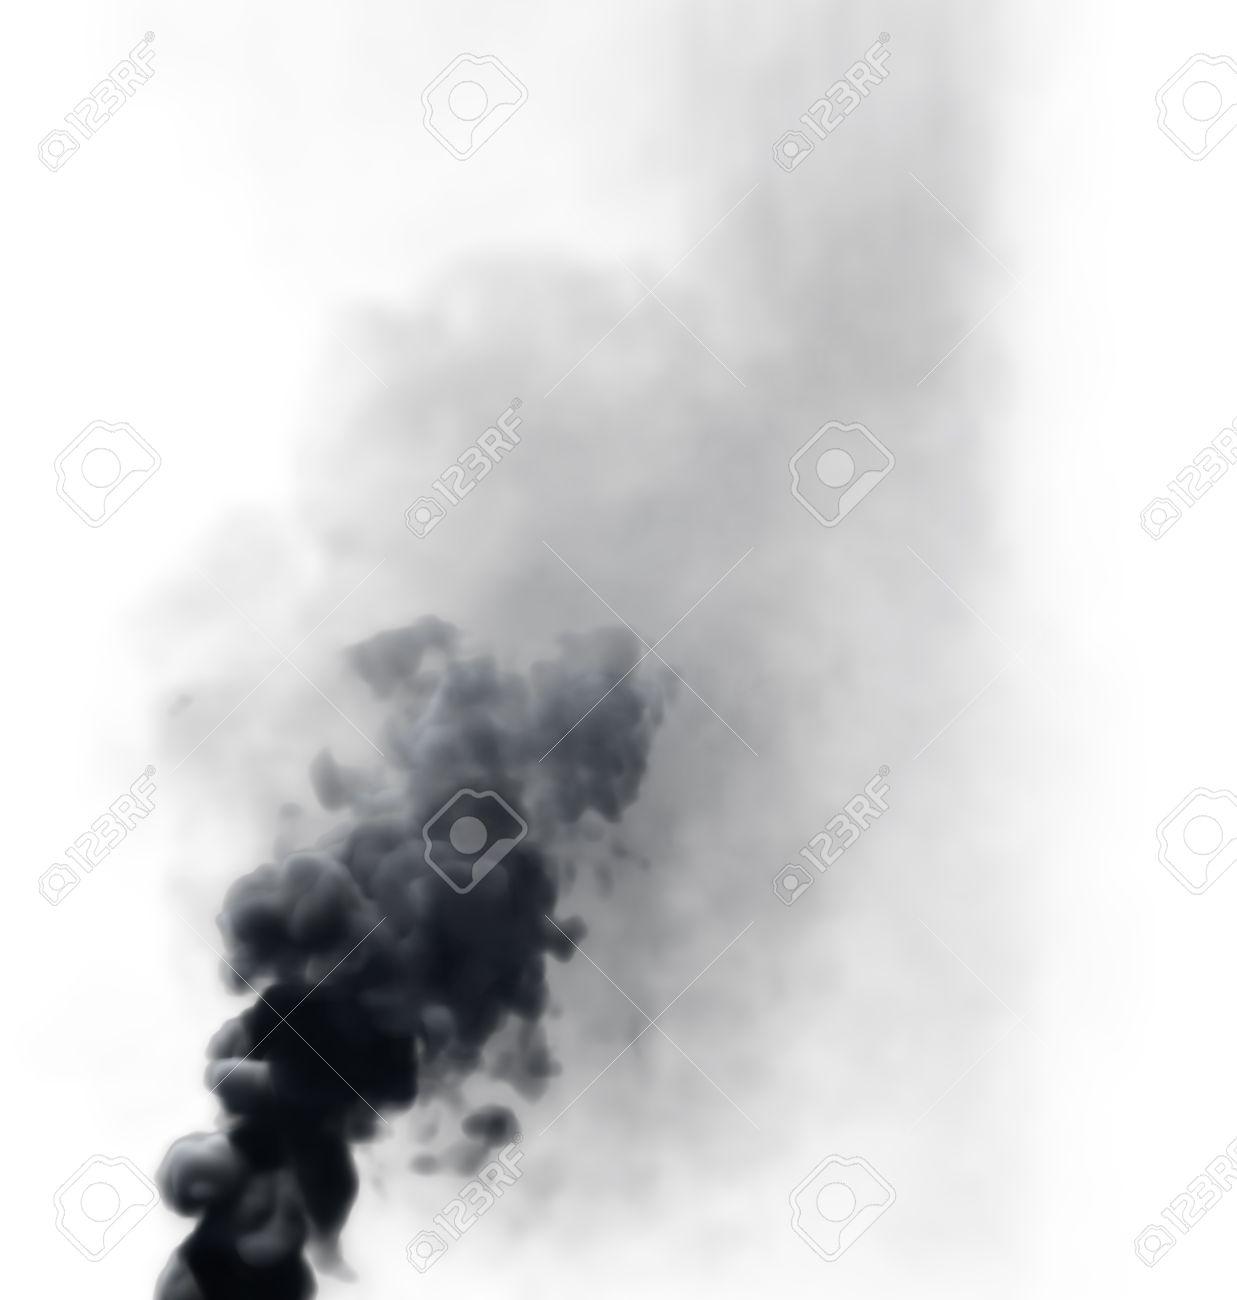 black smoke 2 alpha map in my gallery - 23237892